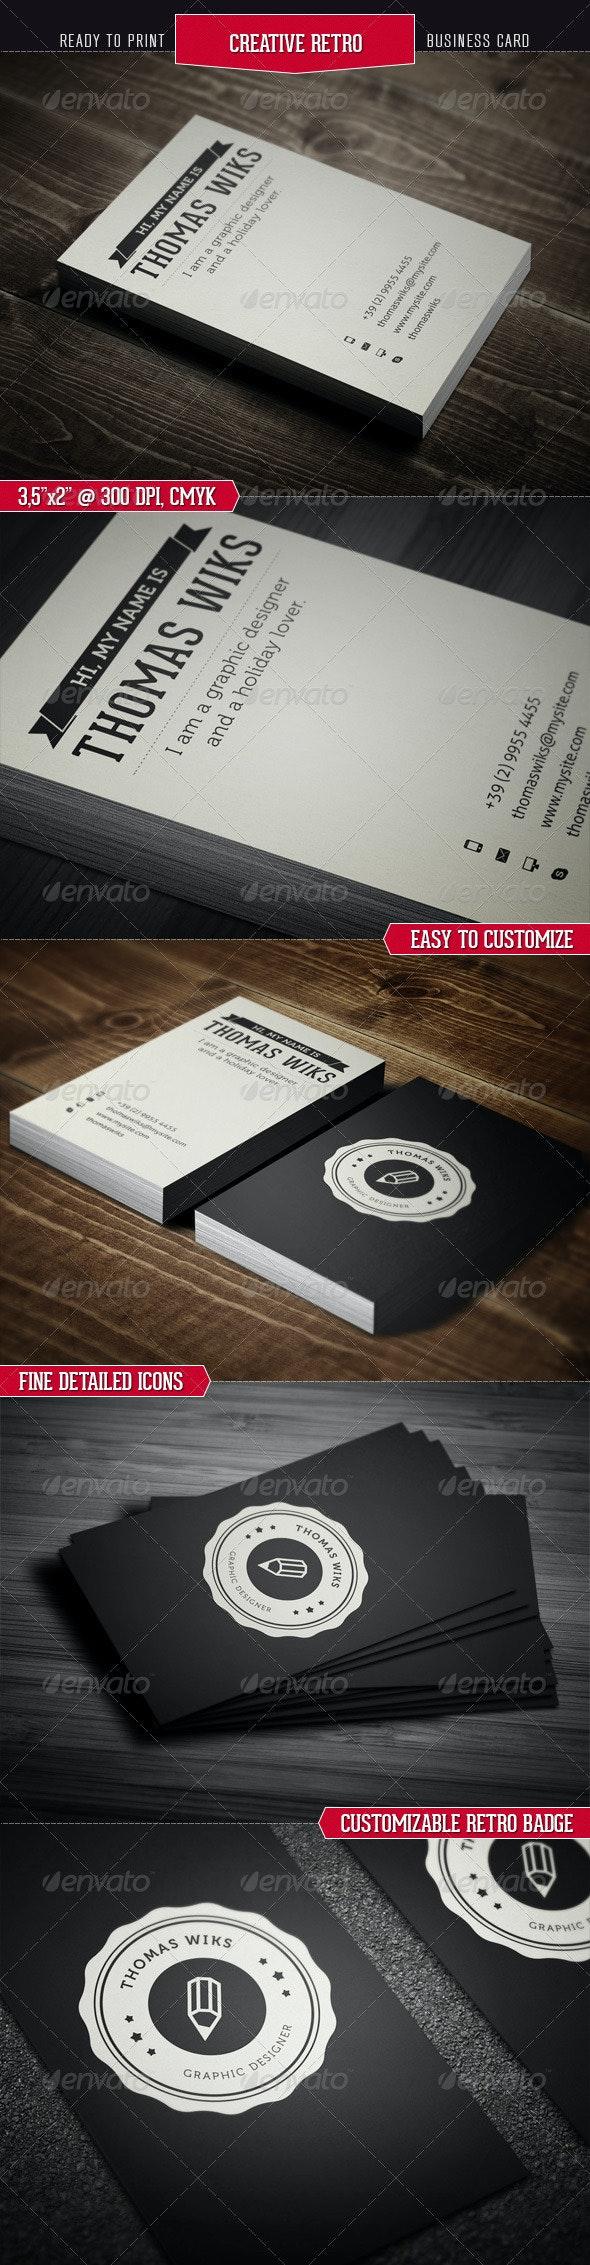 Creative Retro Business Card - Corporate Business Cards